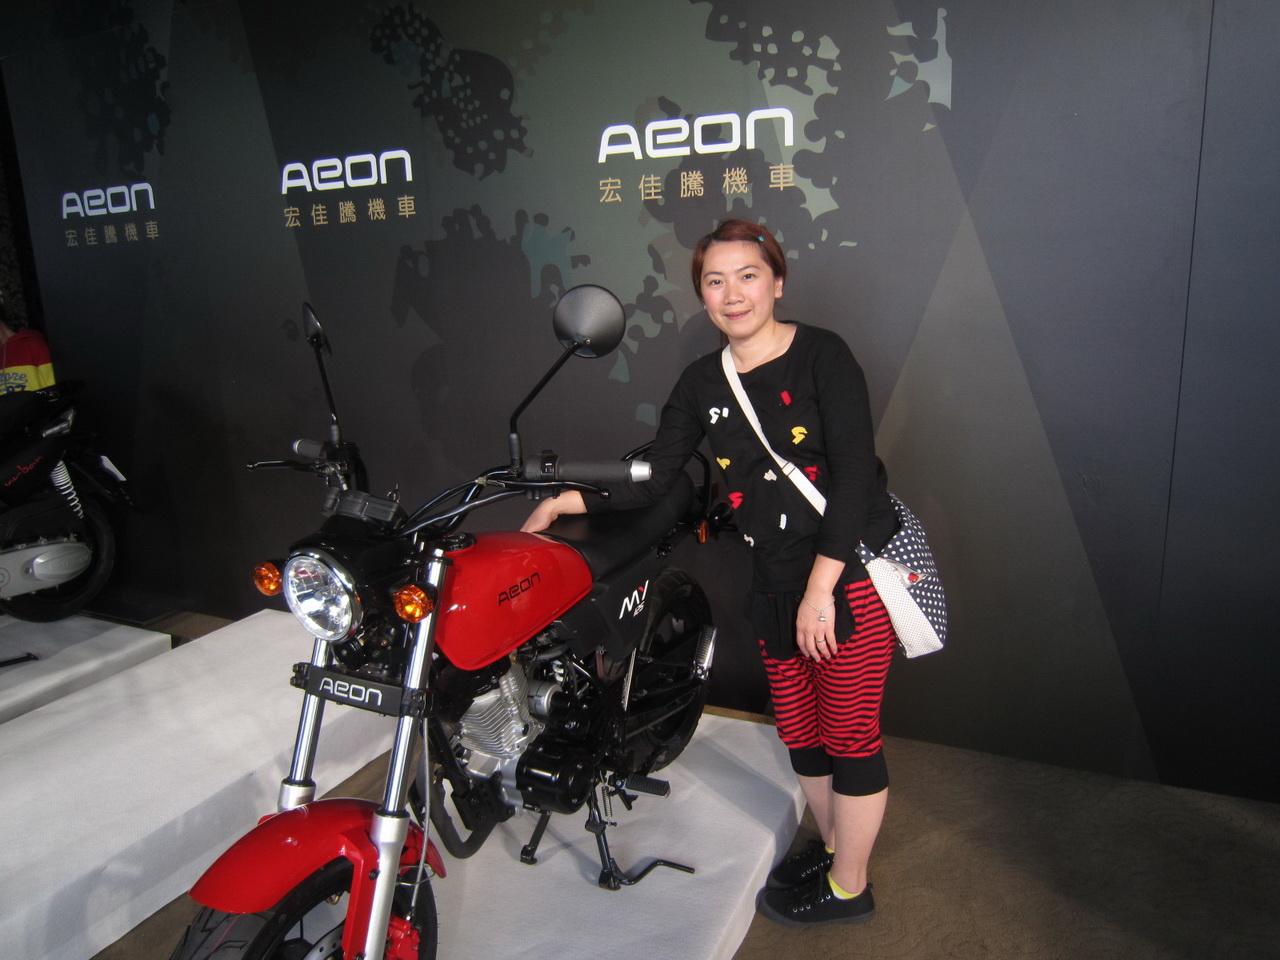 2011-0227a-089.JPG